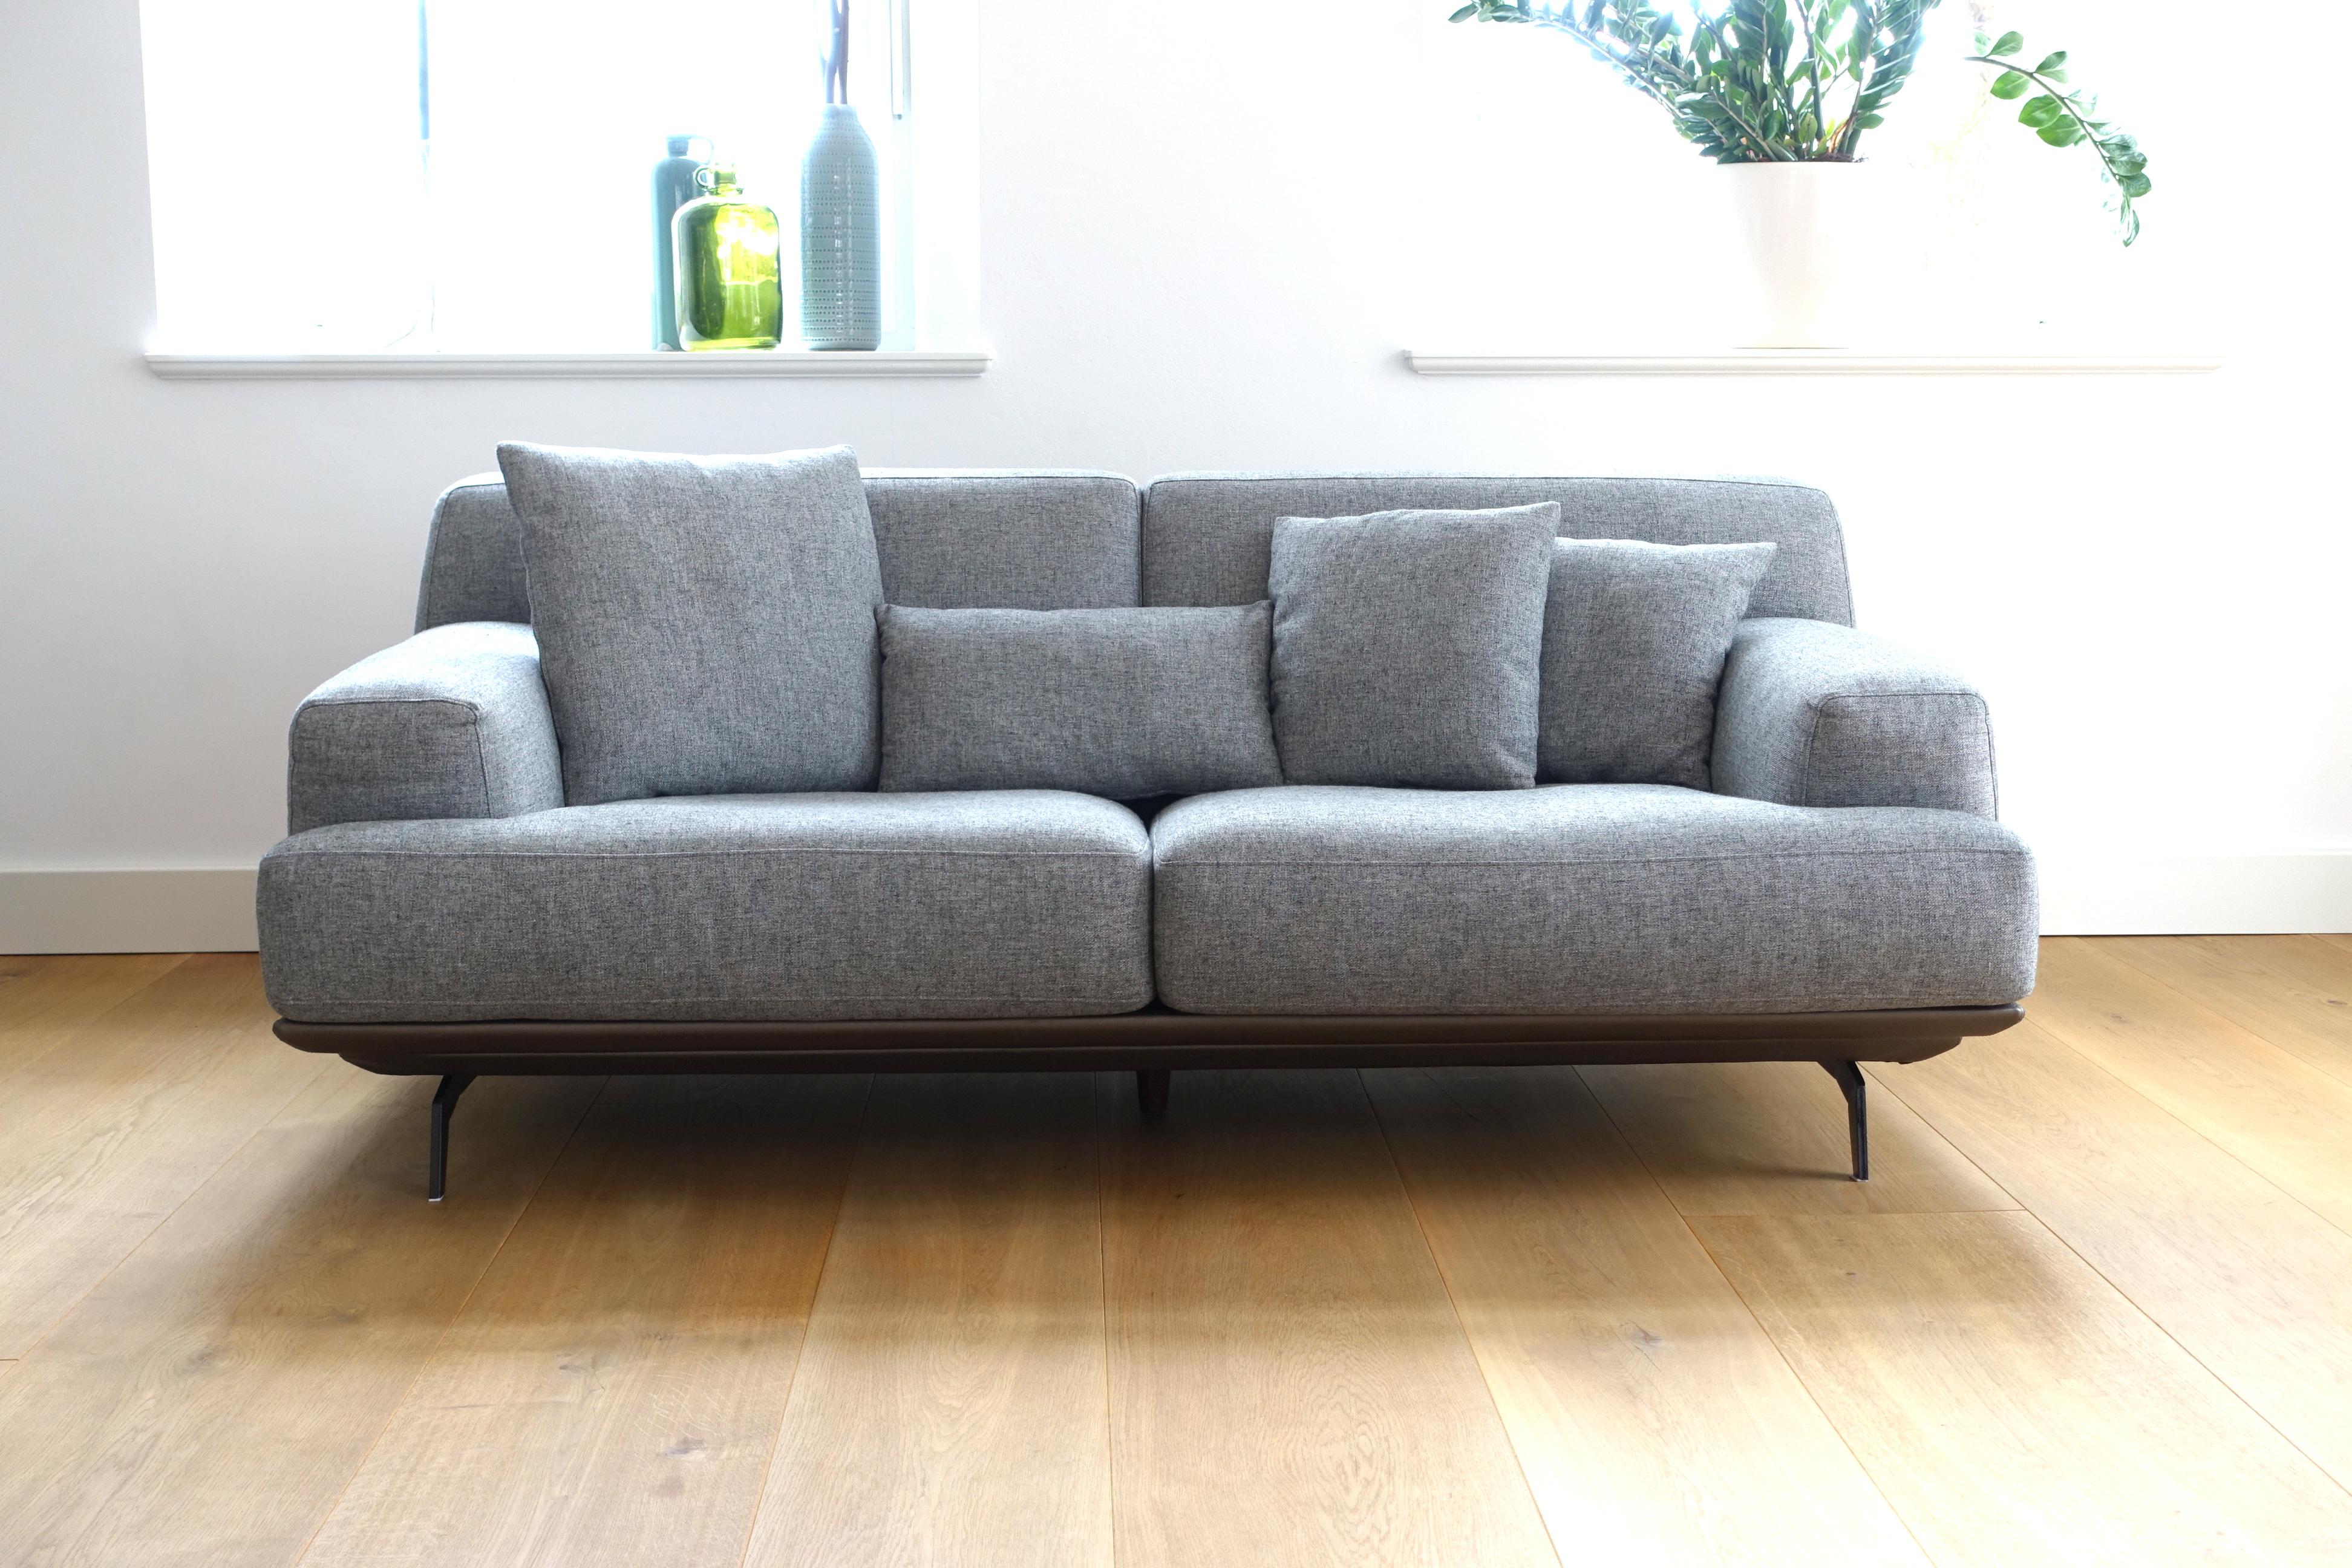 cagusto design sofa lendum 2 sitzer grau couch cagusto. Black Bedroom Furniture Sets. Home Design Ideas